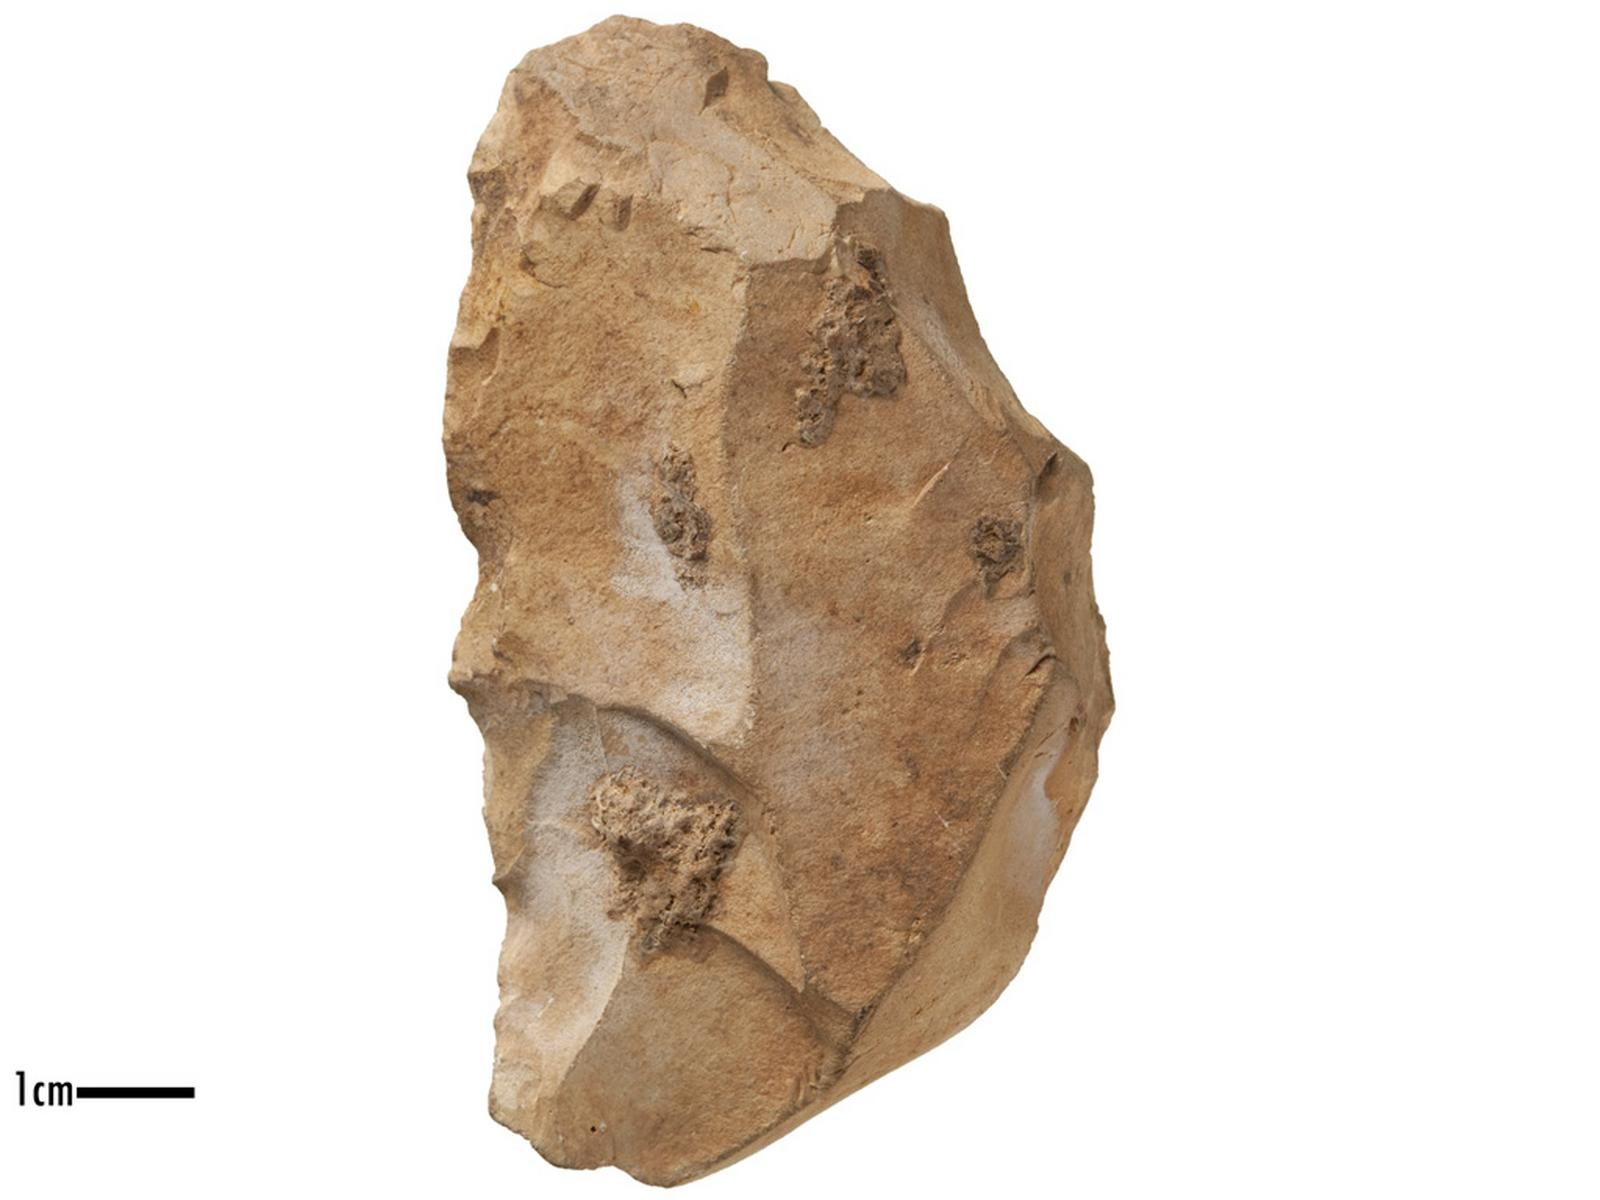 Denticulé (latéral), nucleus (kombewa)_0